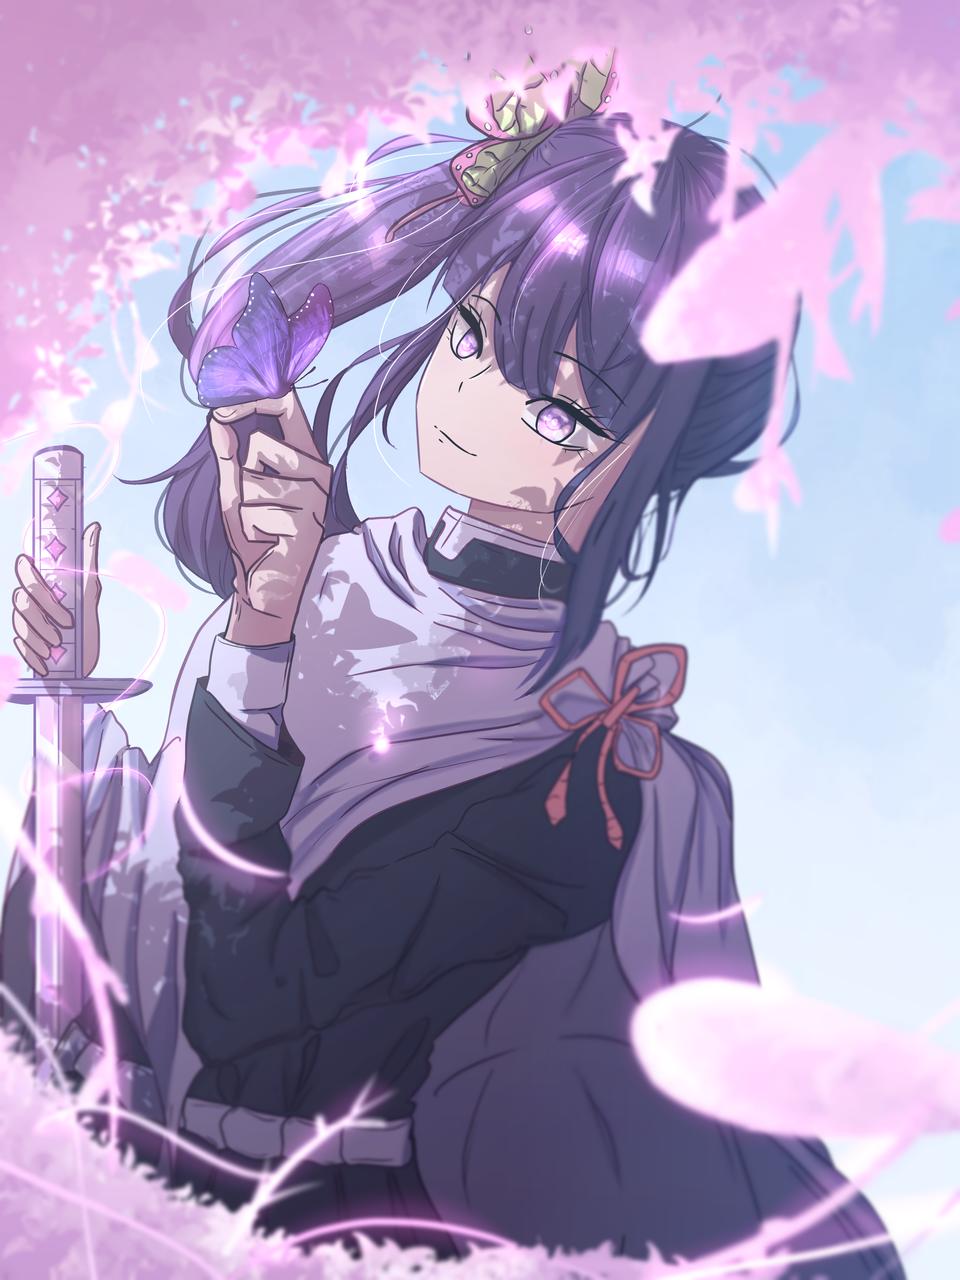 Kanao  Illust of Princewer DemonSlayerFanartContest medibangpaint